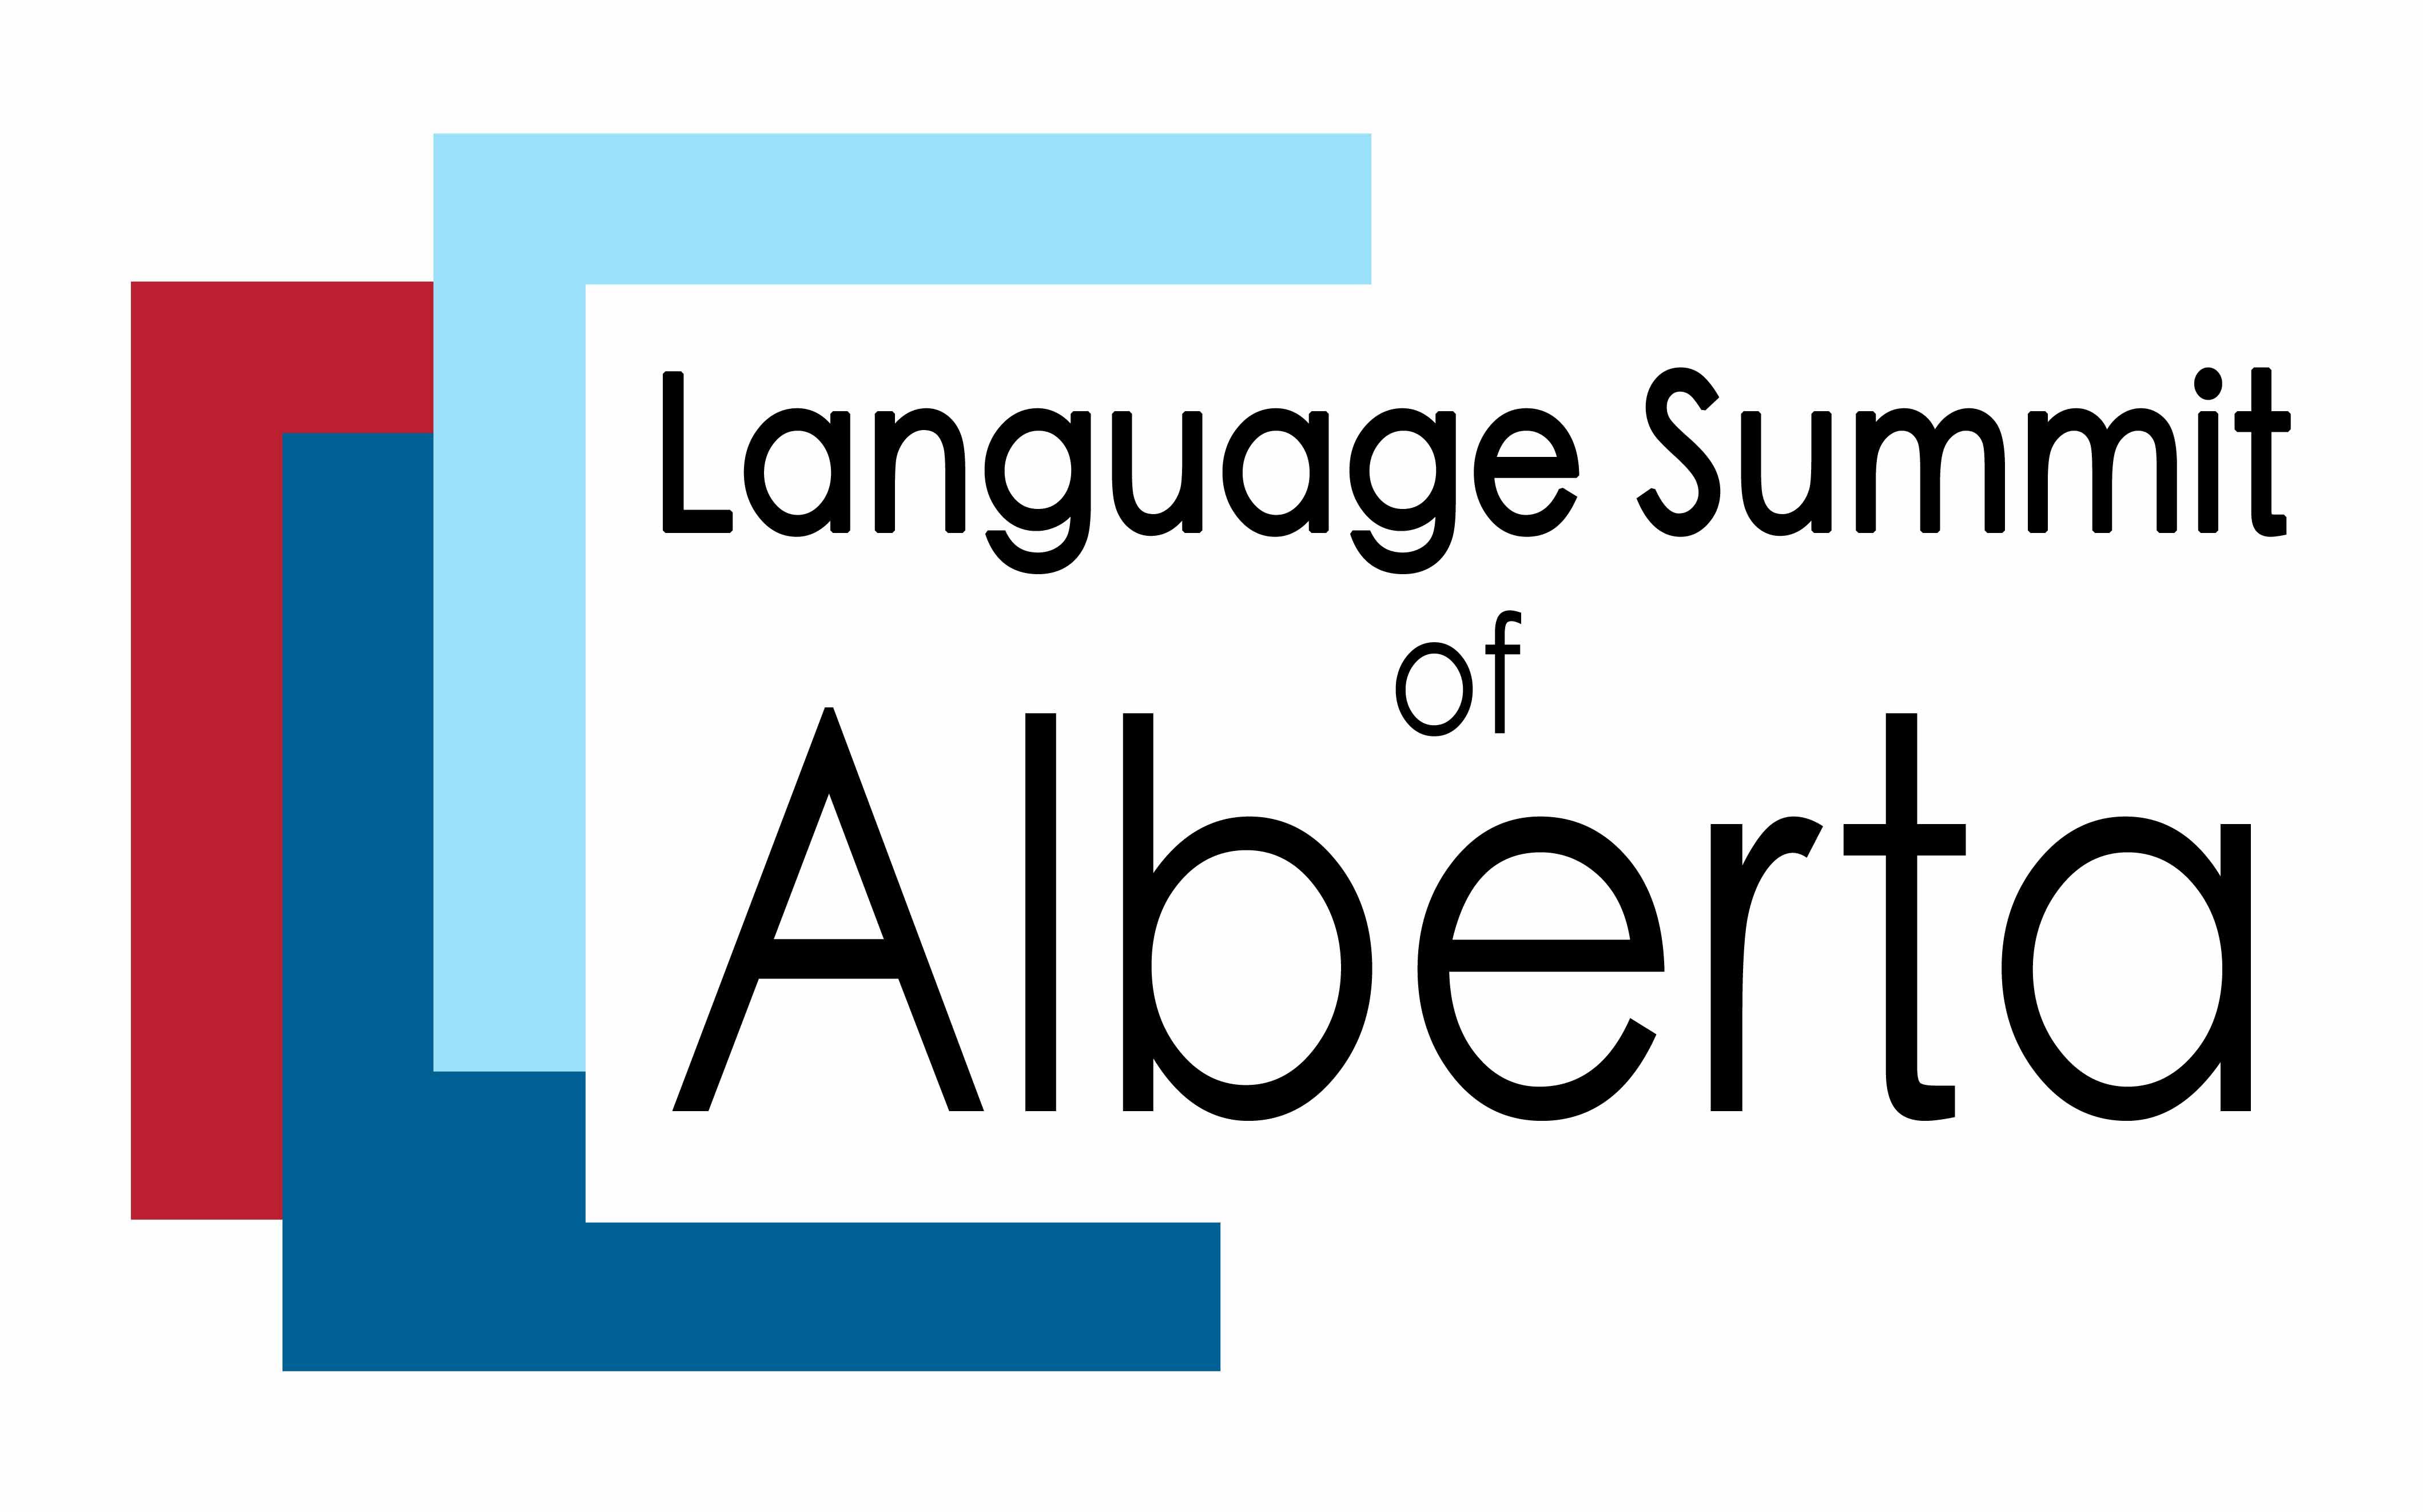 Language Summit of Alberta